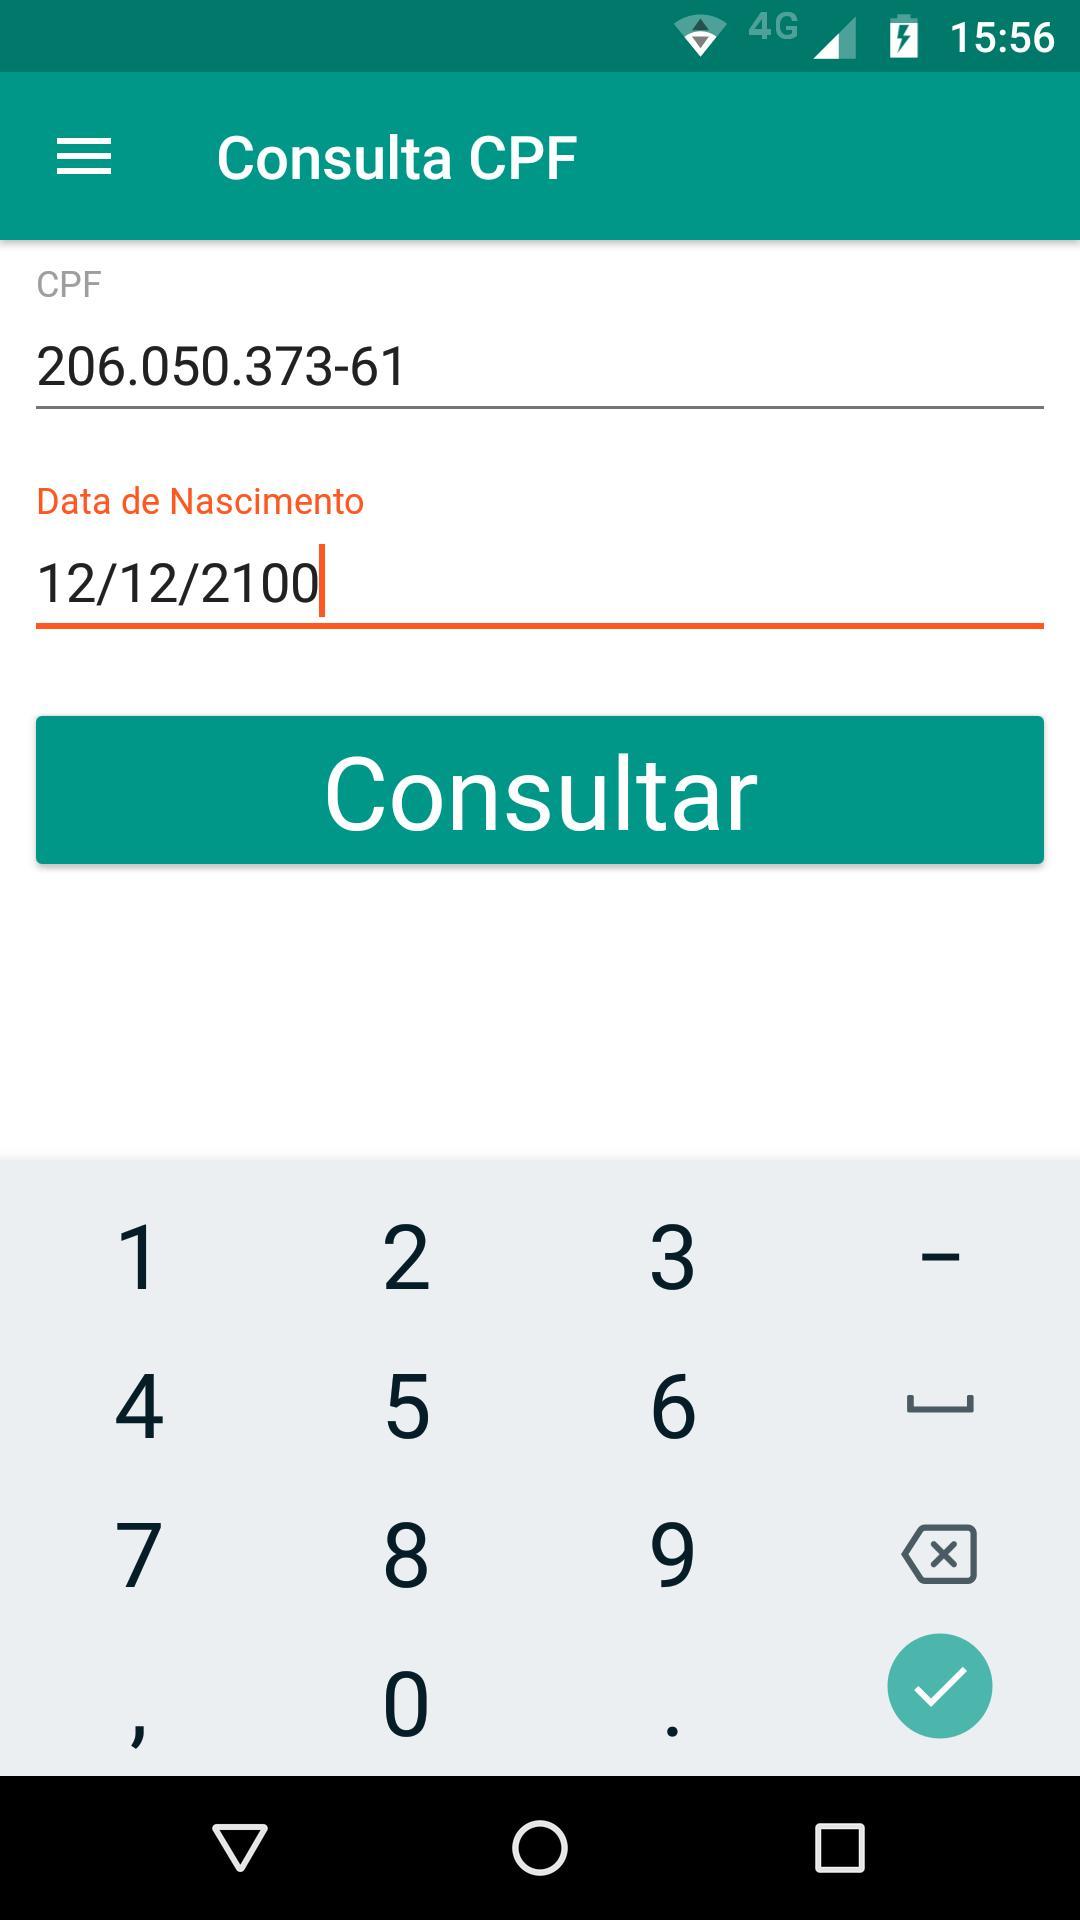 Consulta CPF for Android - APK Download